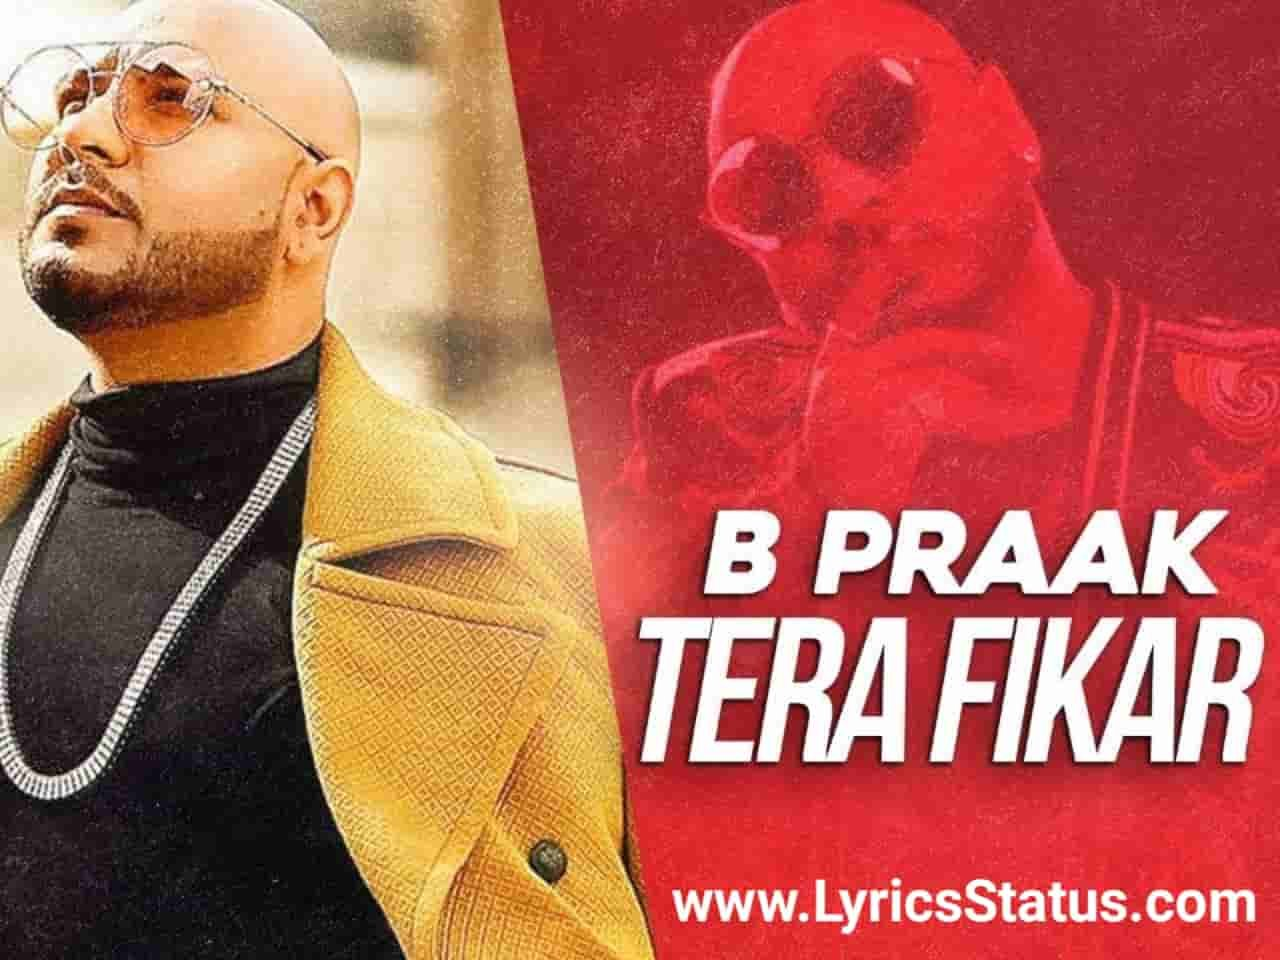 B Praak Tera Fikar rahe menu Lyrics Jaani status download